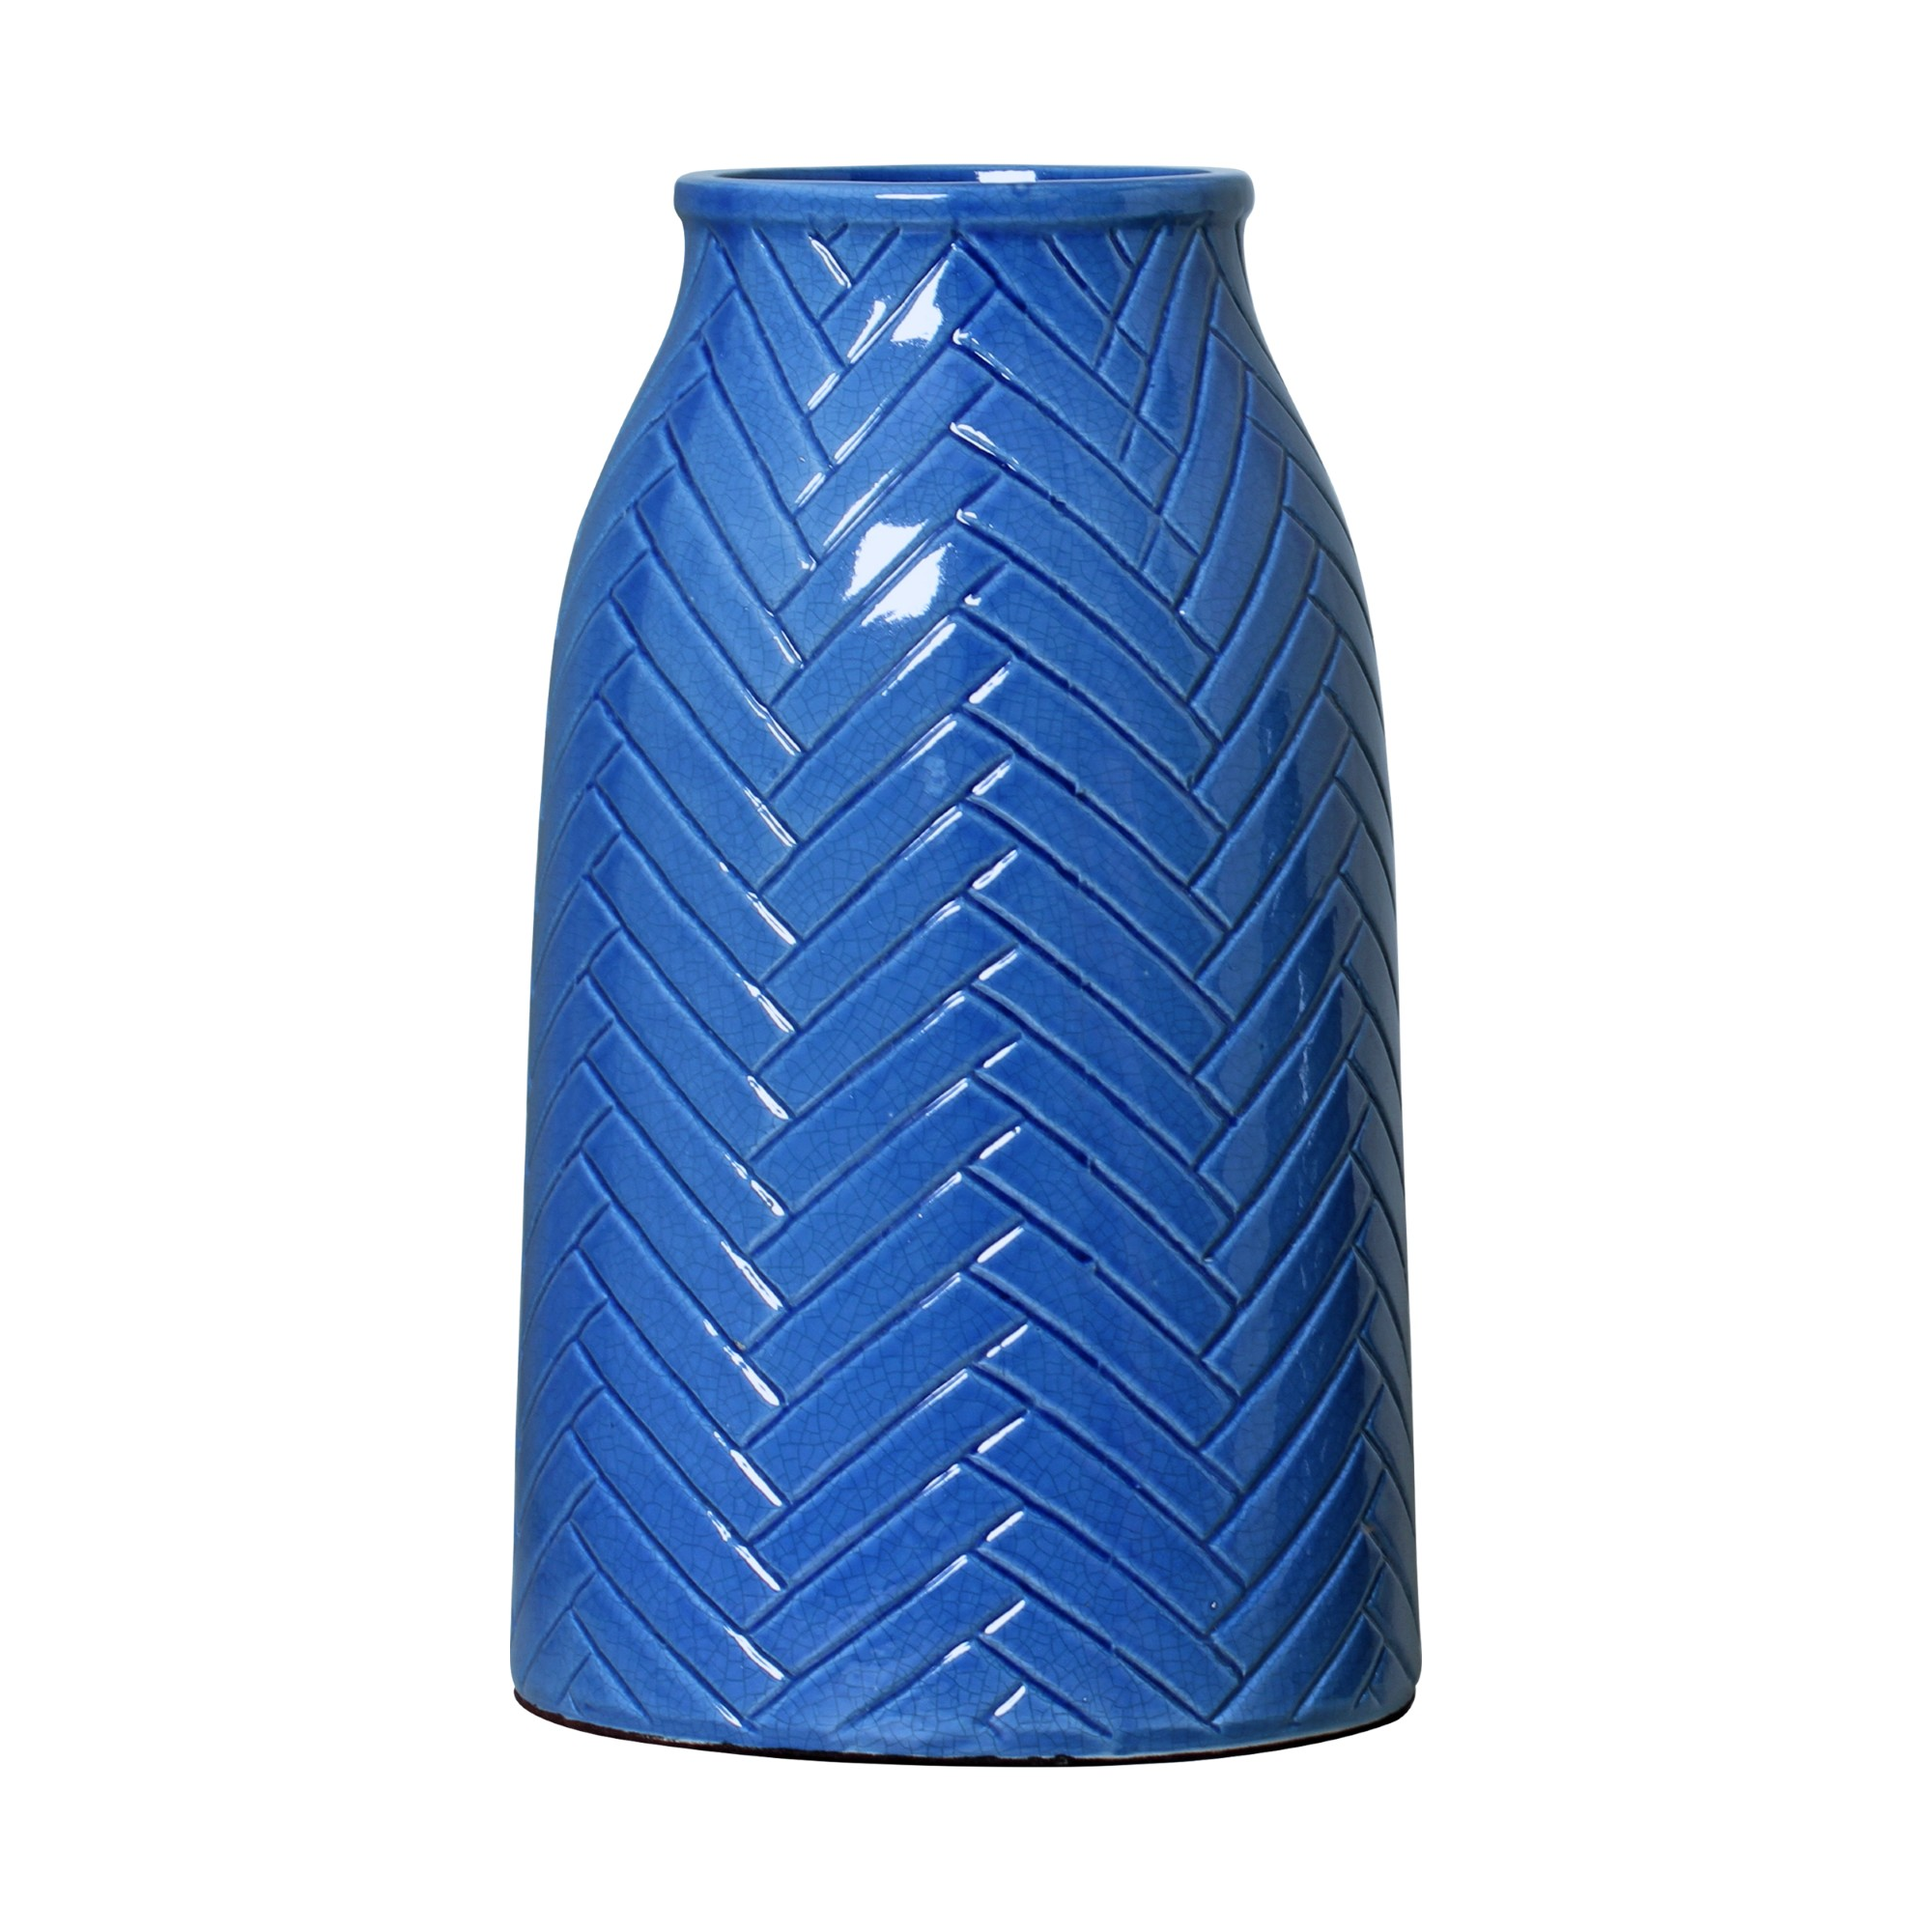 Vaso Decorativo Ceramica 40cm Redondo Azul Claro 5293 - Ana Maria